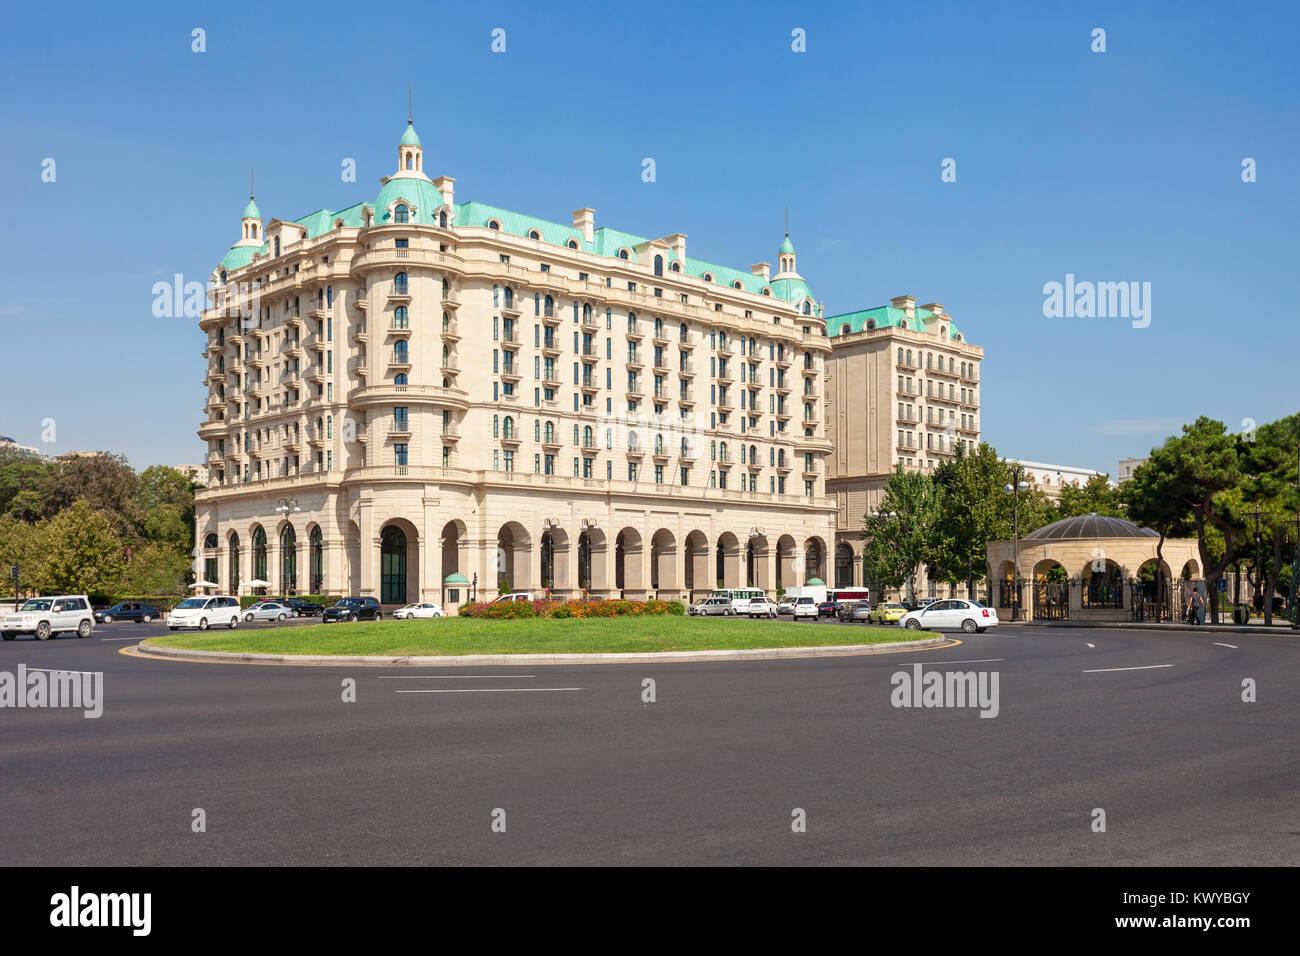 Four Seasons Hotel Baku is a hotel in Baku, the capital of Azerbaijan. Hotel is located on the Neftchilar Avenue - Stock Image